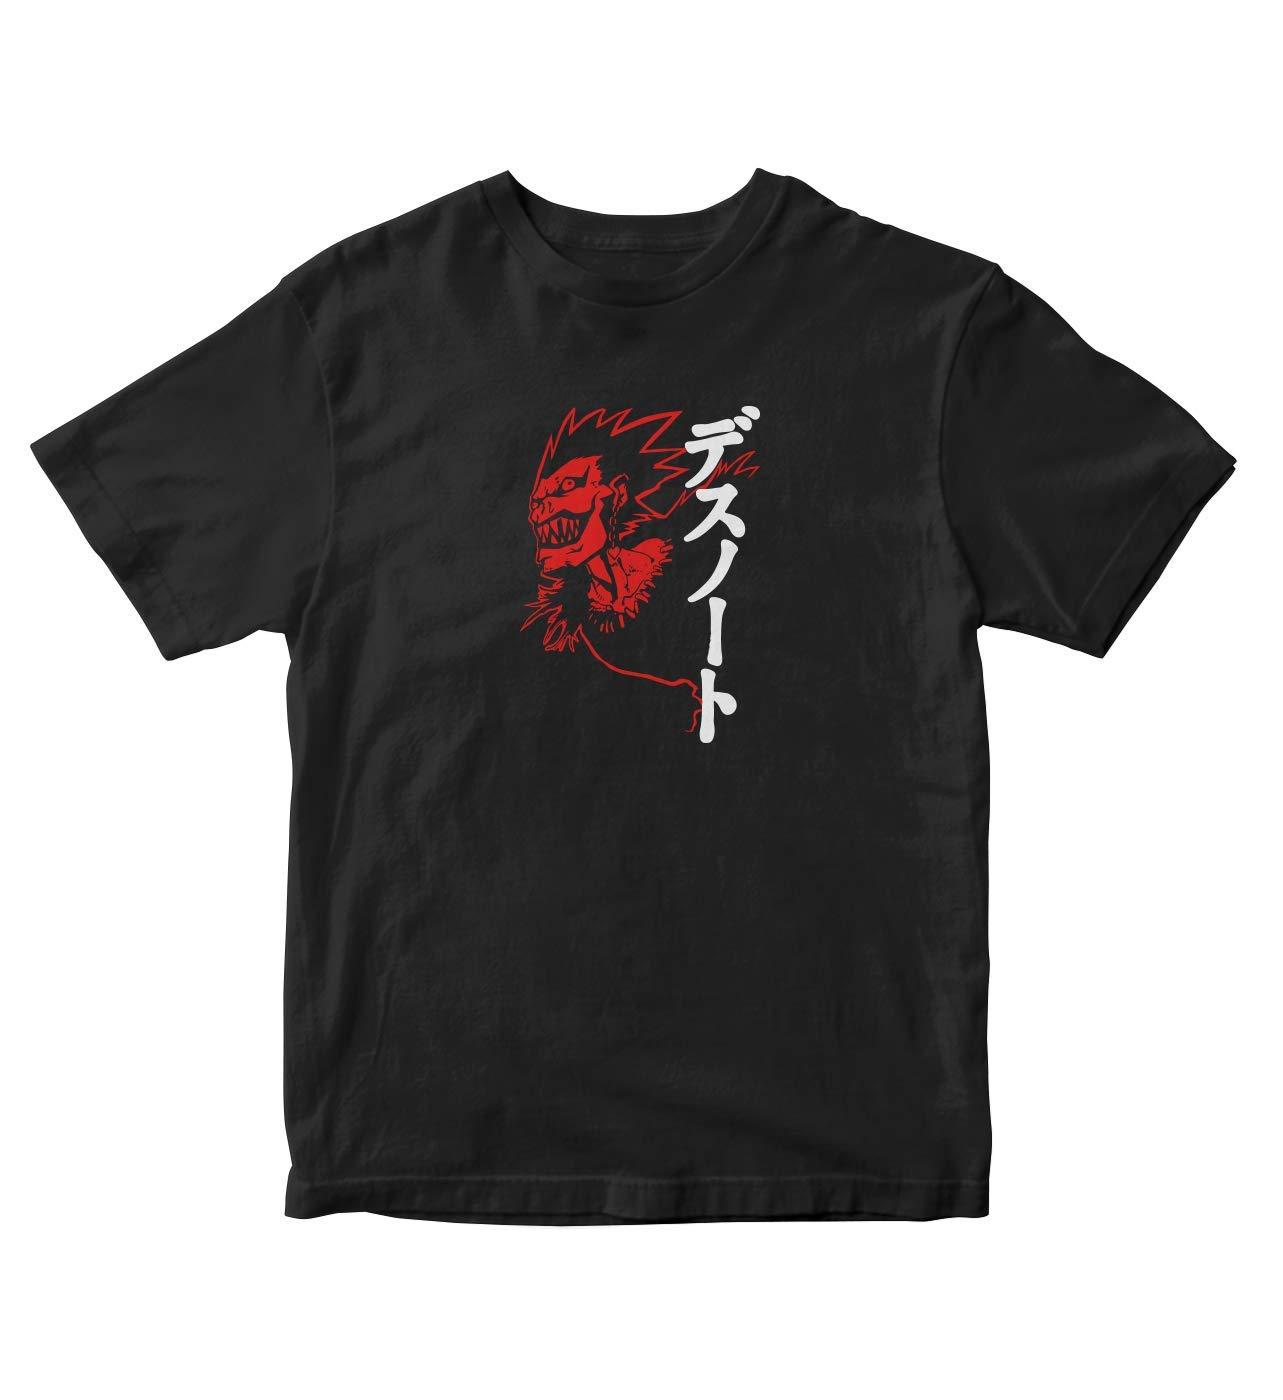 Tjsports Ry Face Kanji Death Note Anime Manga S Black Shirt A779